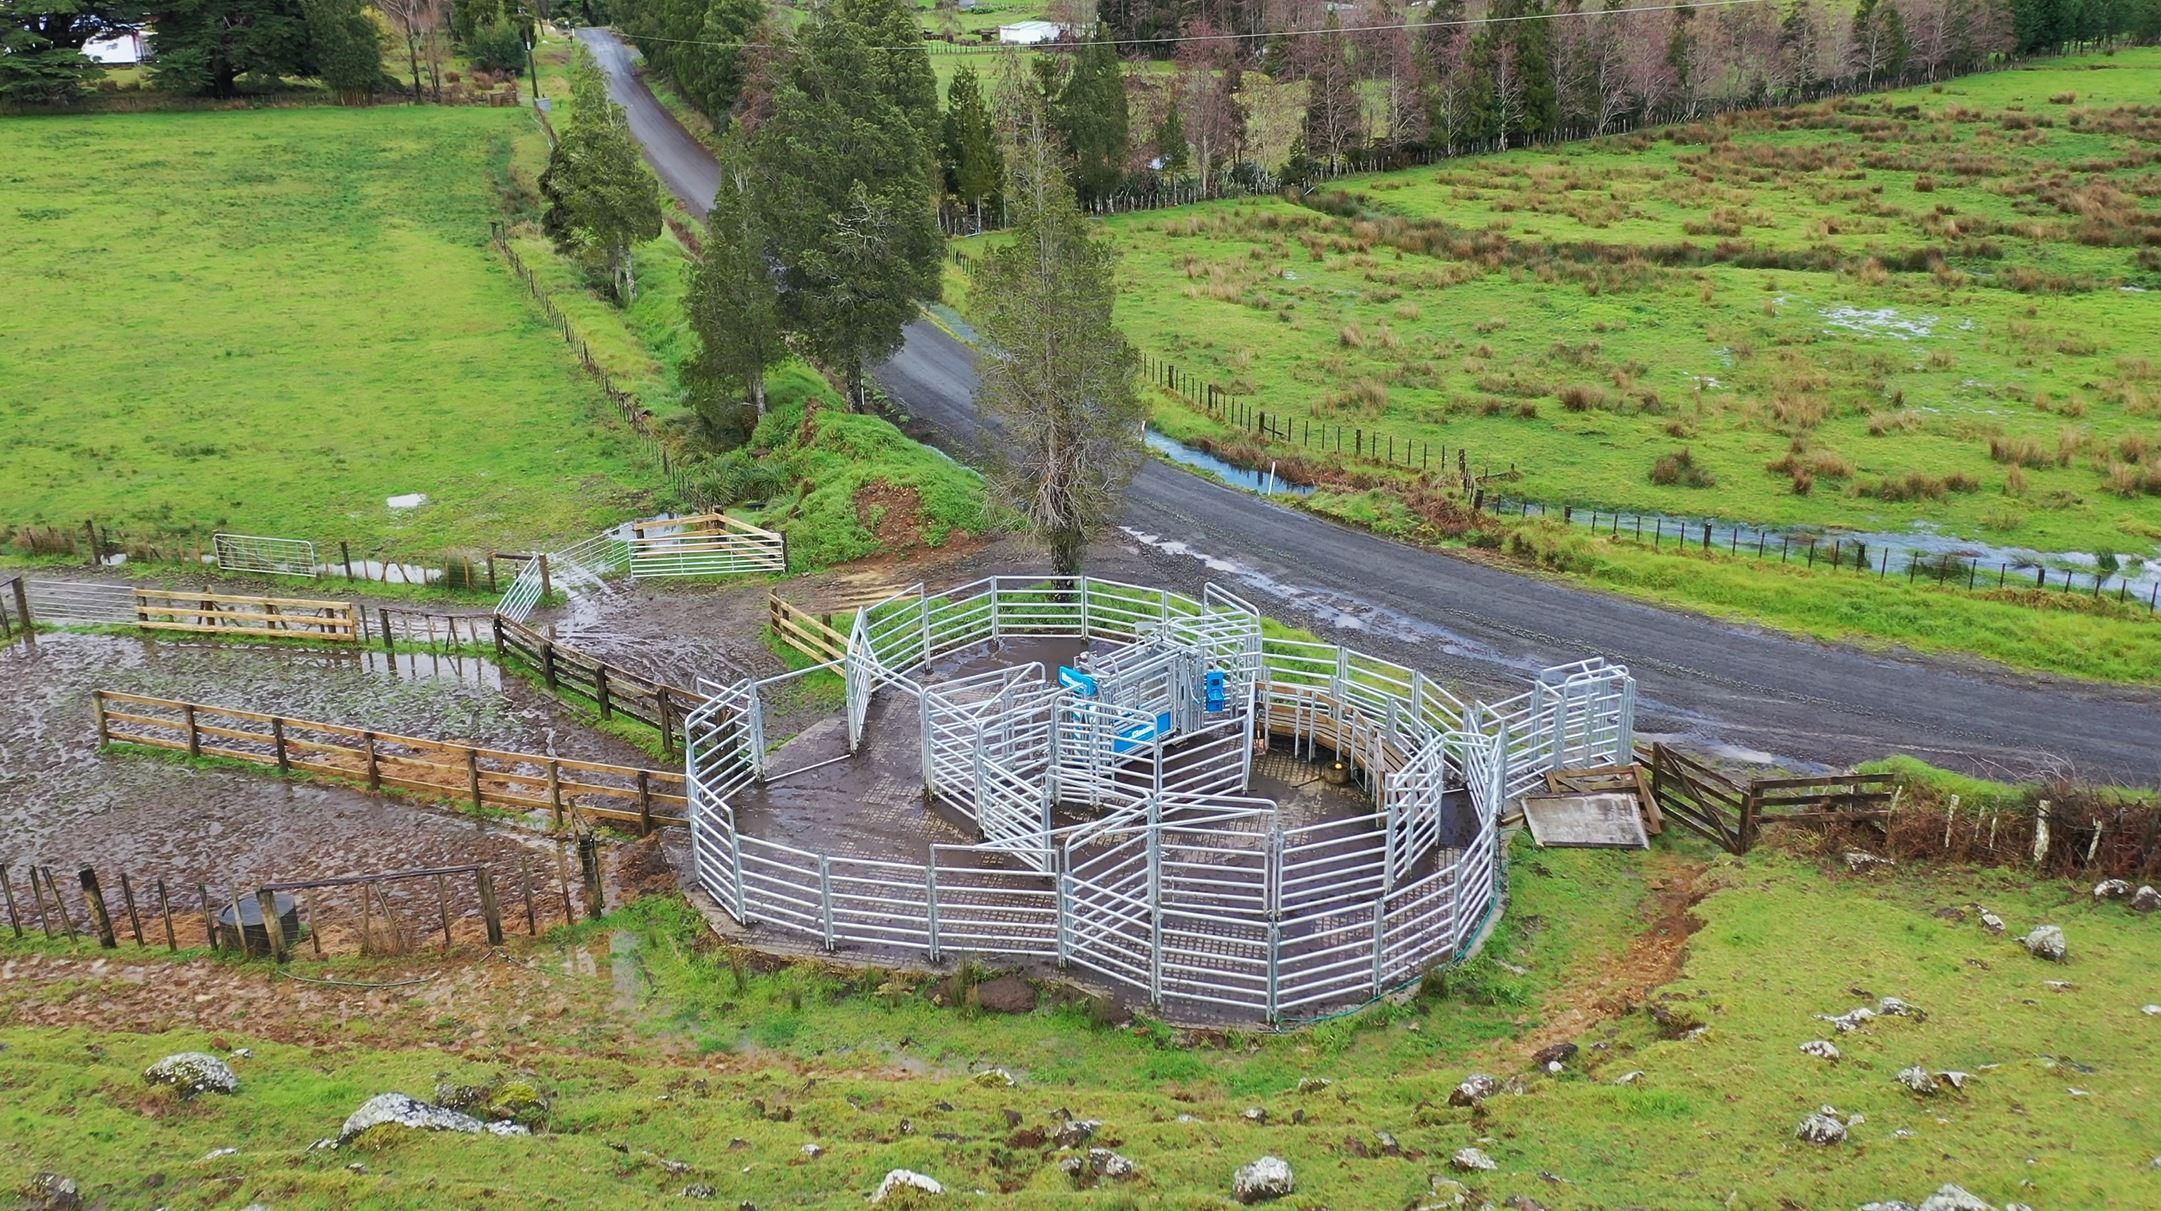 ian webb steel cattle yards nz, build plans hereford cattle breeders (2)